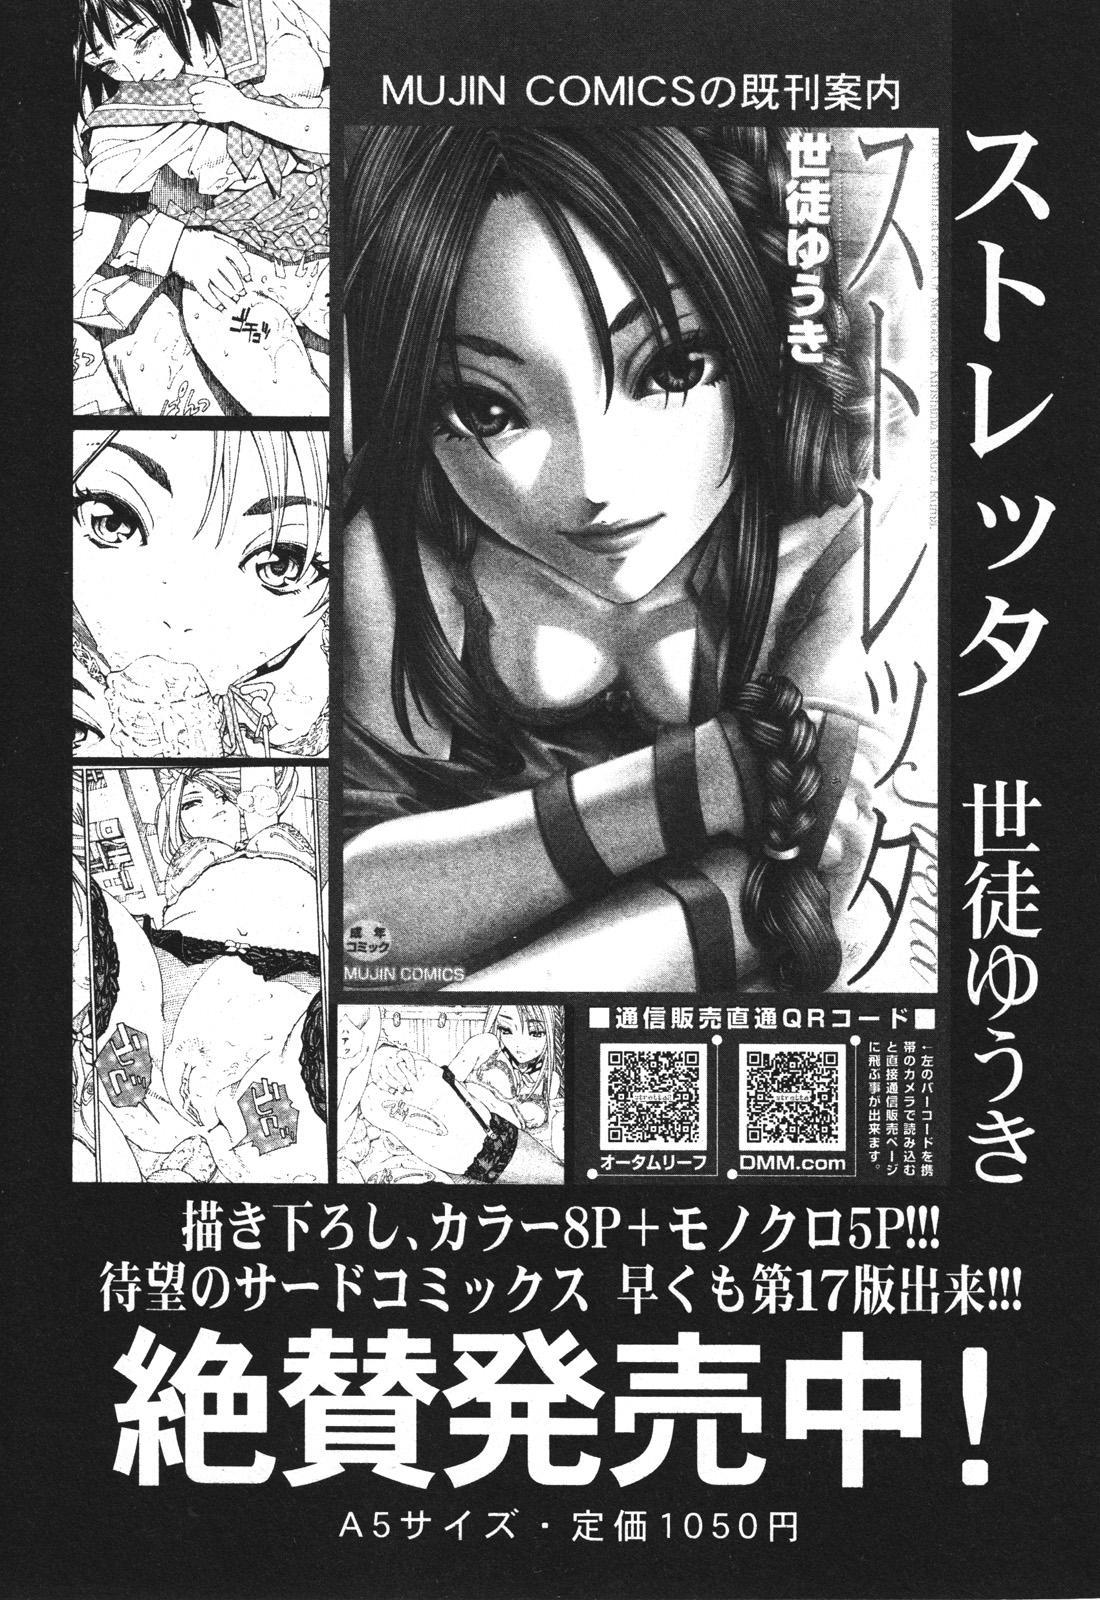 BUSTER COMIC 2010-05 Vol.07 107